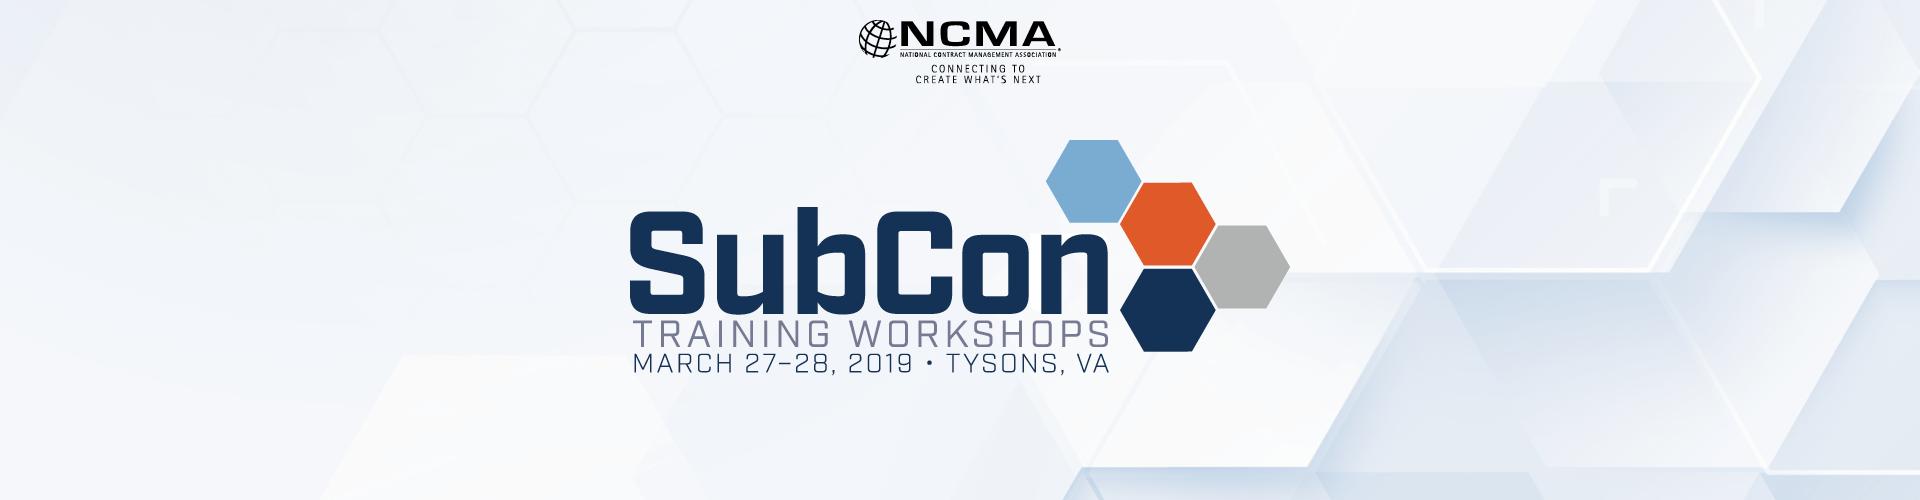 SubCon Training Workshops 2019